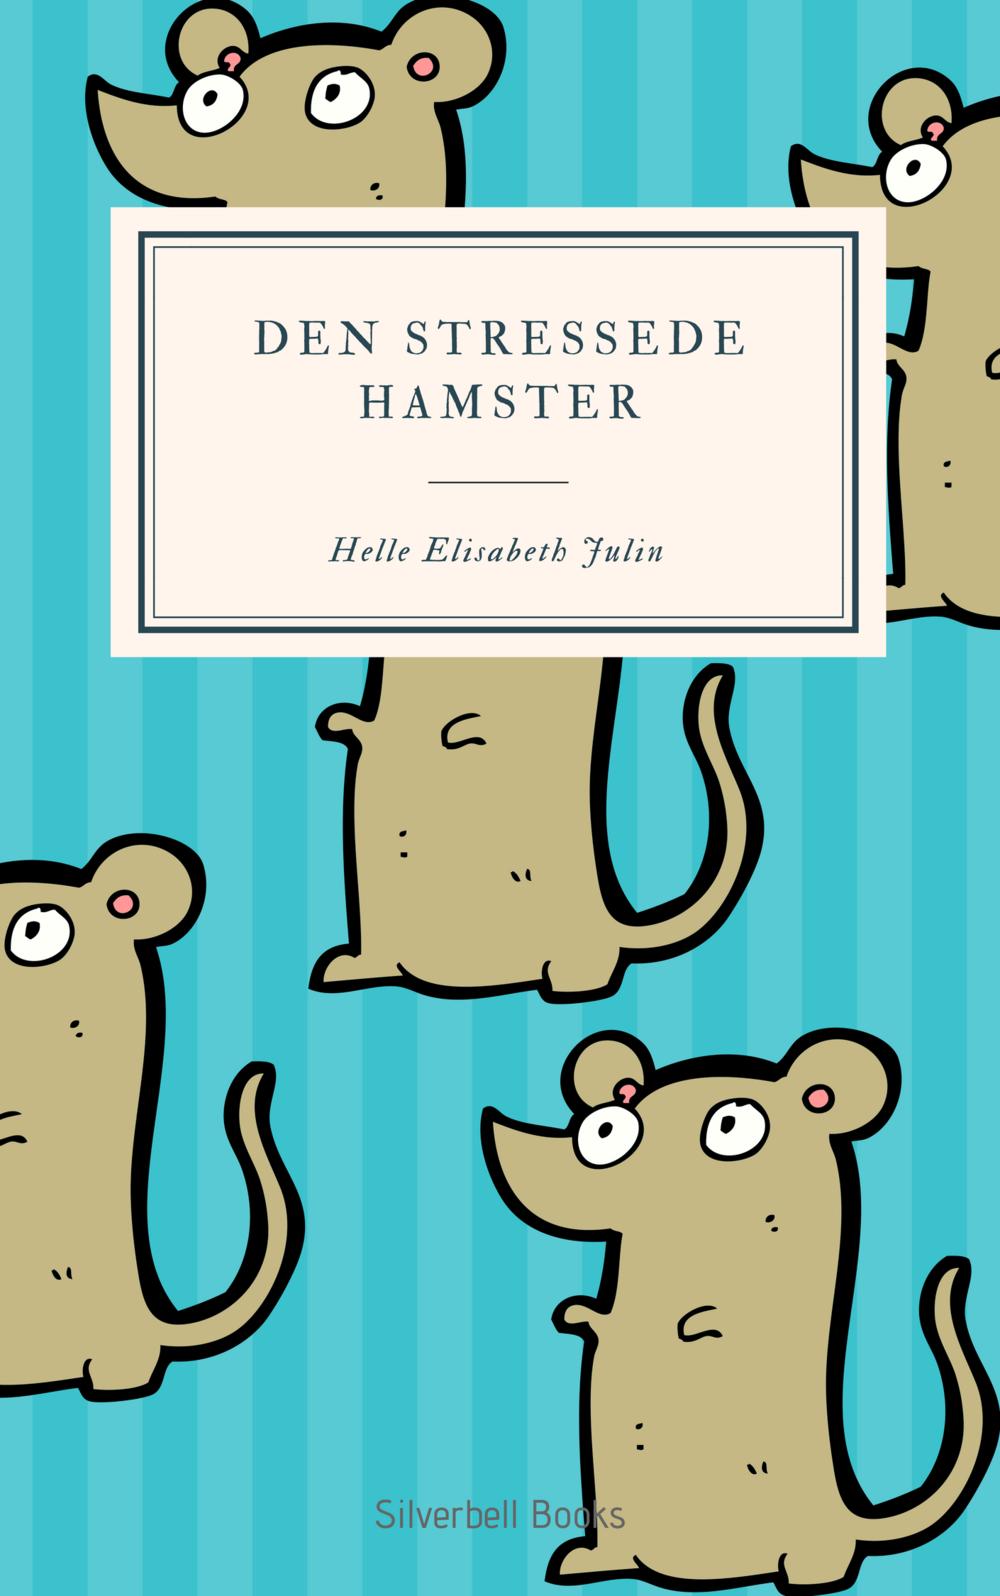 Copy of Den stressede hamster